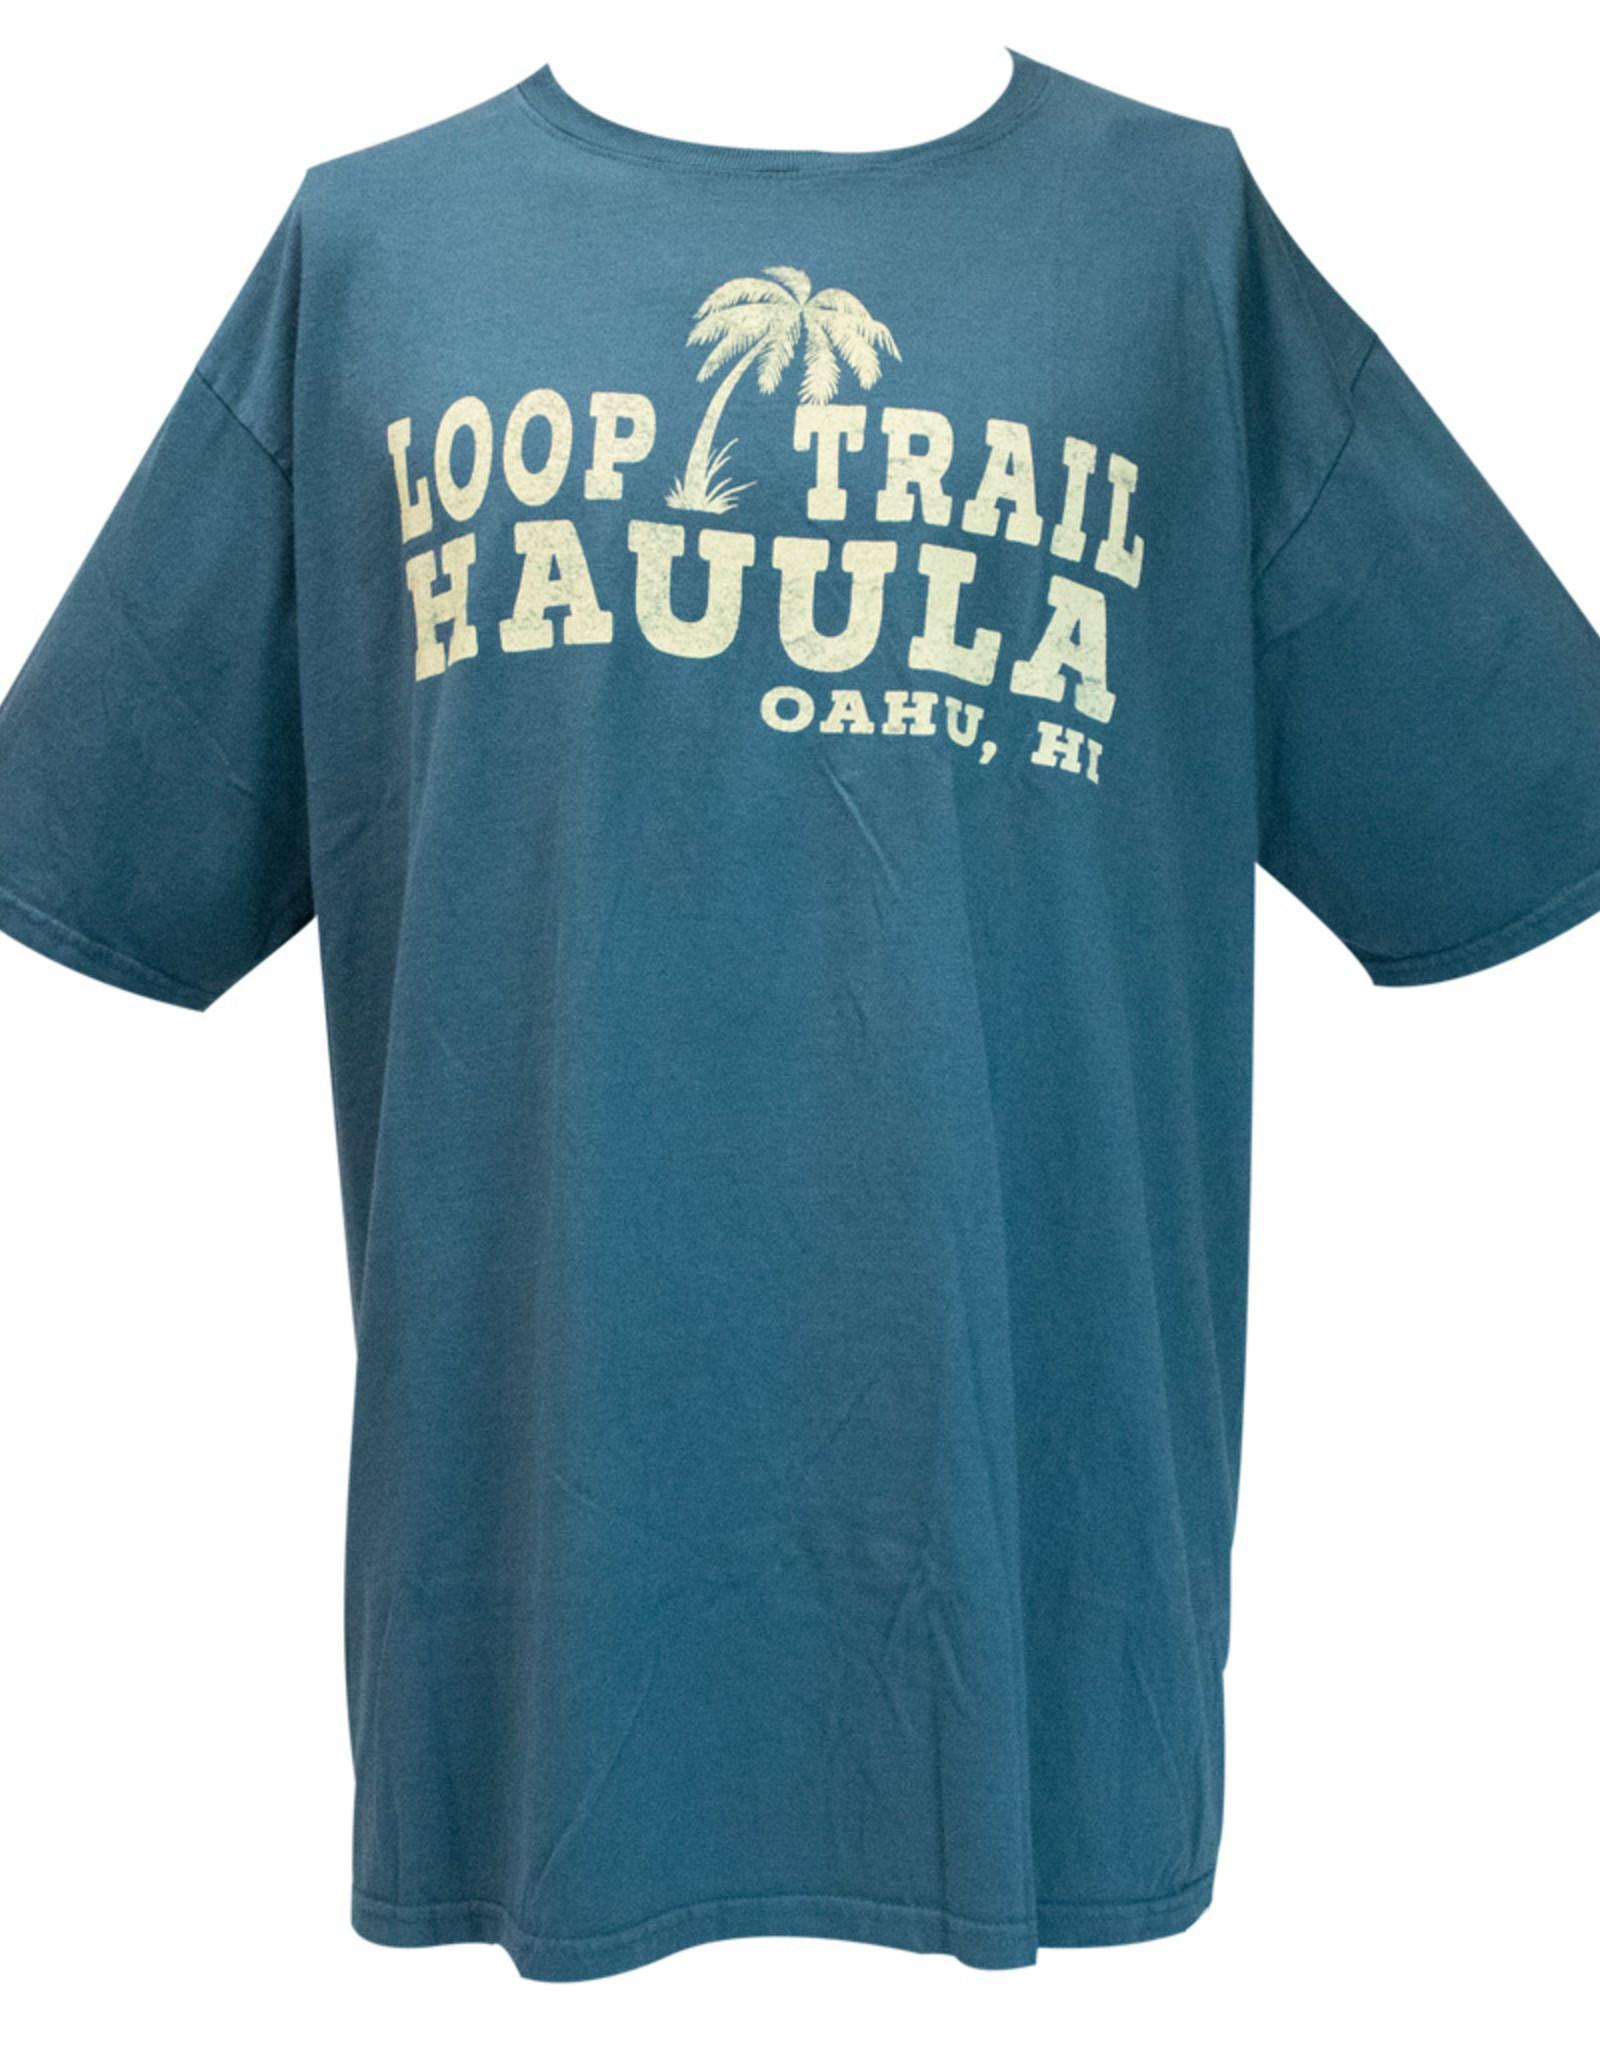 Clearance - Loop Trail Hauula Shirt